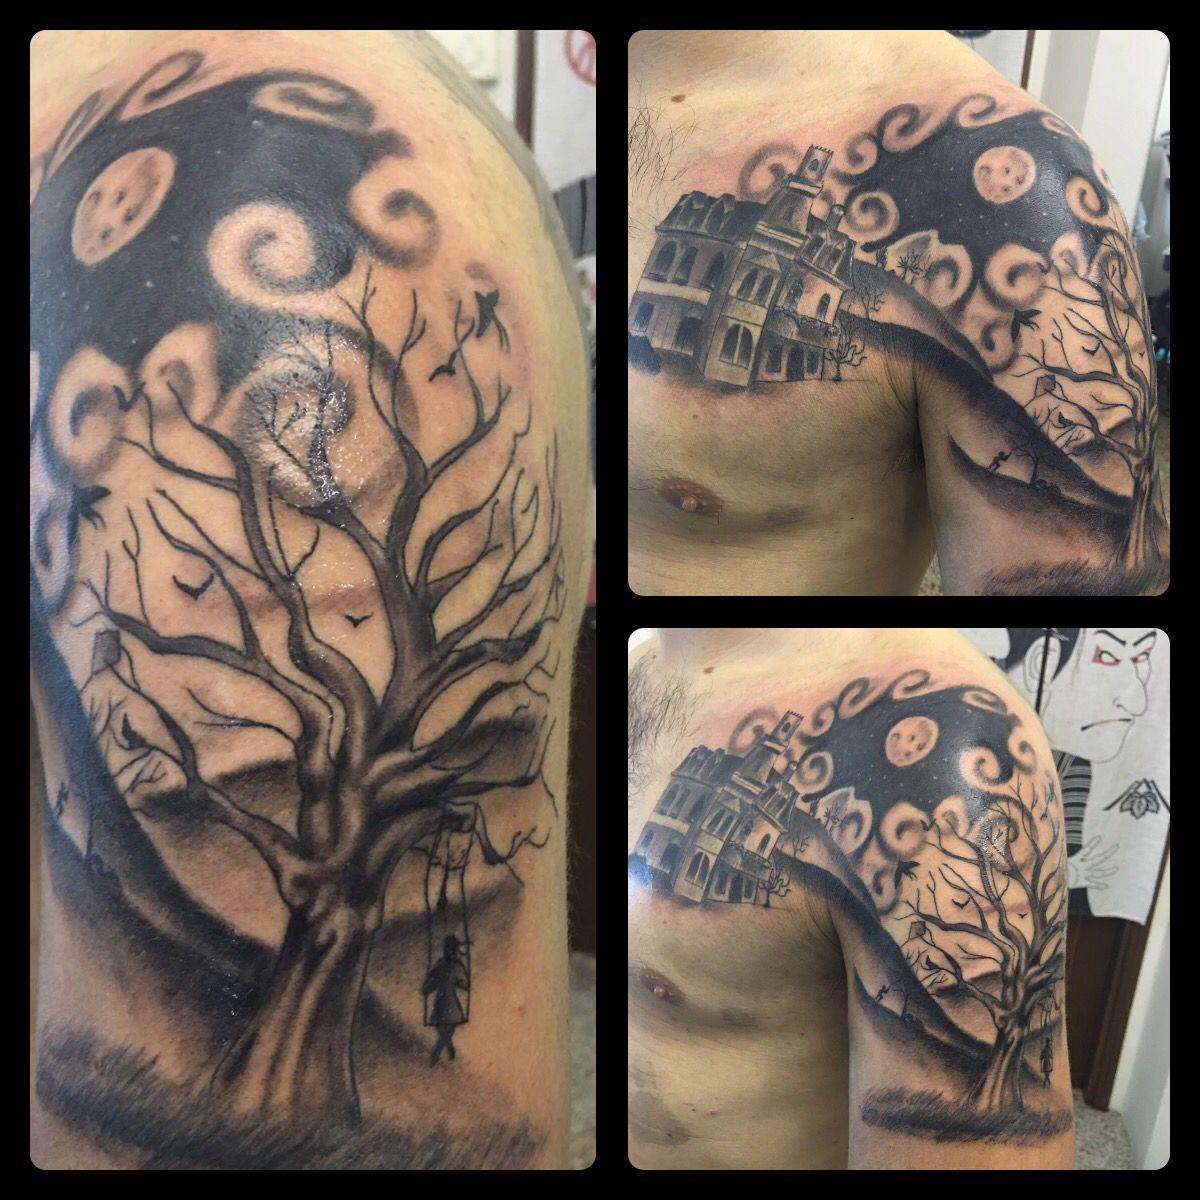 PMP Tattoo Parlour  by Albi   #darkness #tattoo #tattoos #tattooed #ink #inked #inktattoo #flower #black #tattooedgirls #dark #blackwhite #now #love #me #mix #flowersink #girl #amezing #special #instacool  #instagood #inked #love #picoftheday #tree @albi_koruti @pmp_tattoo_parlour